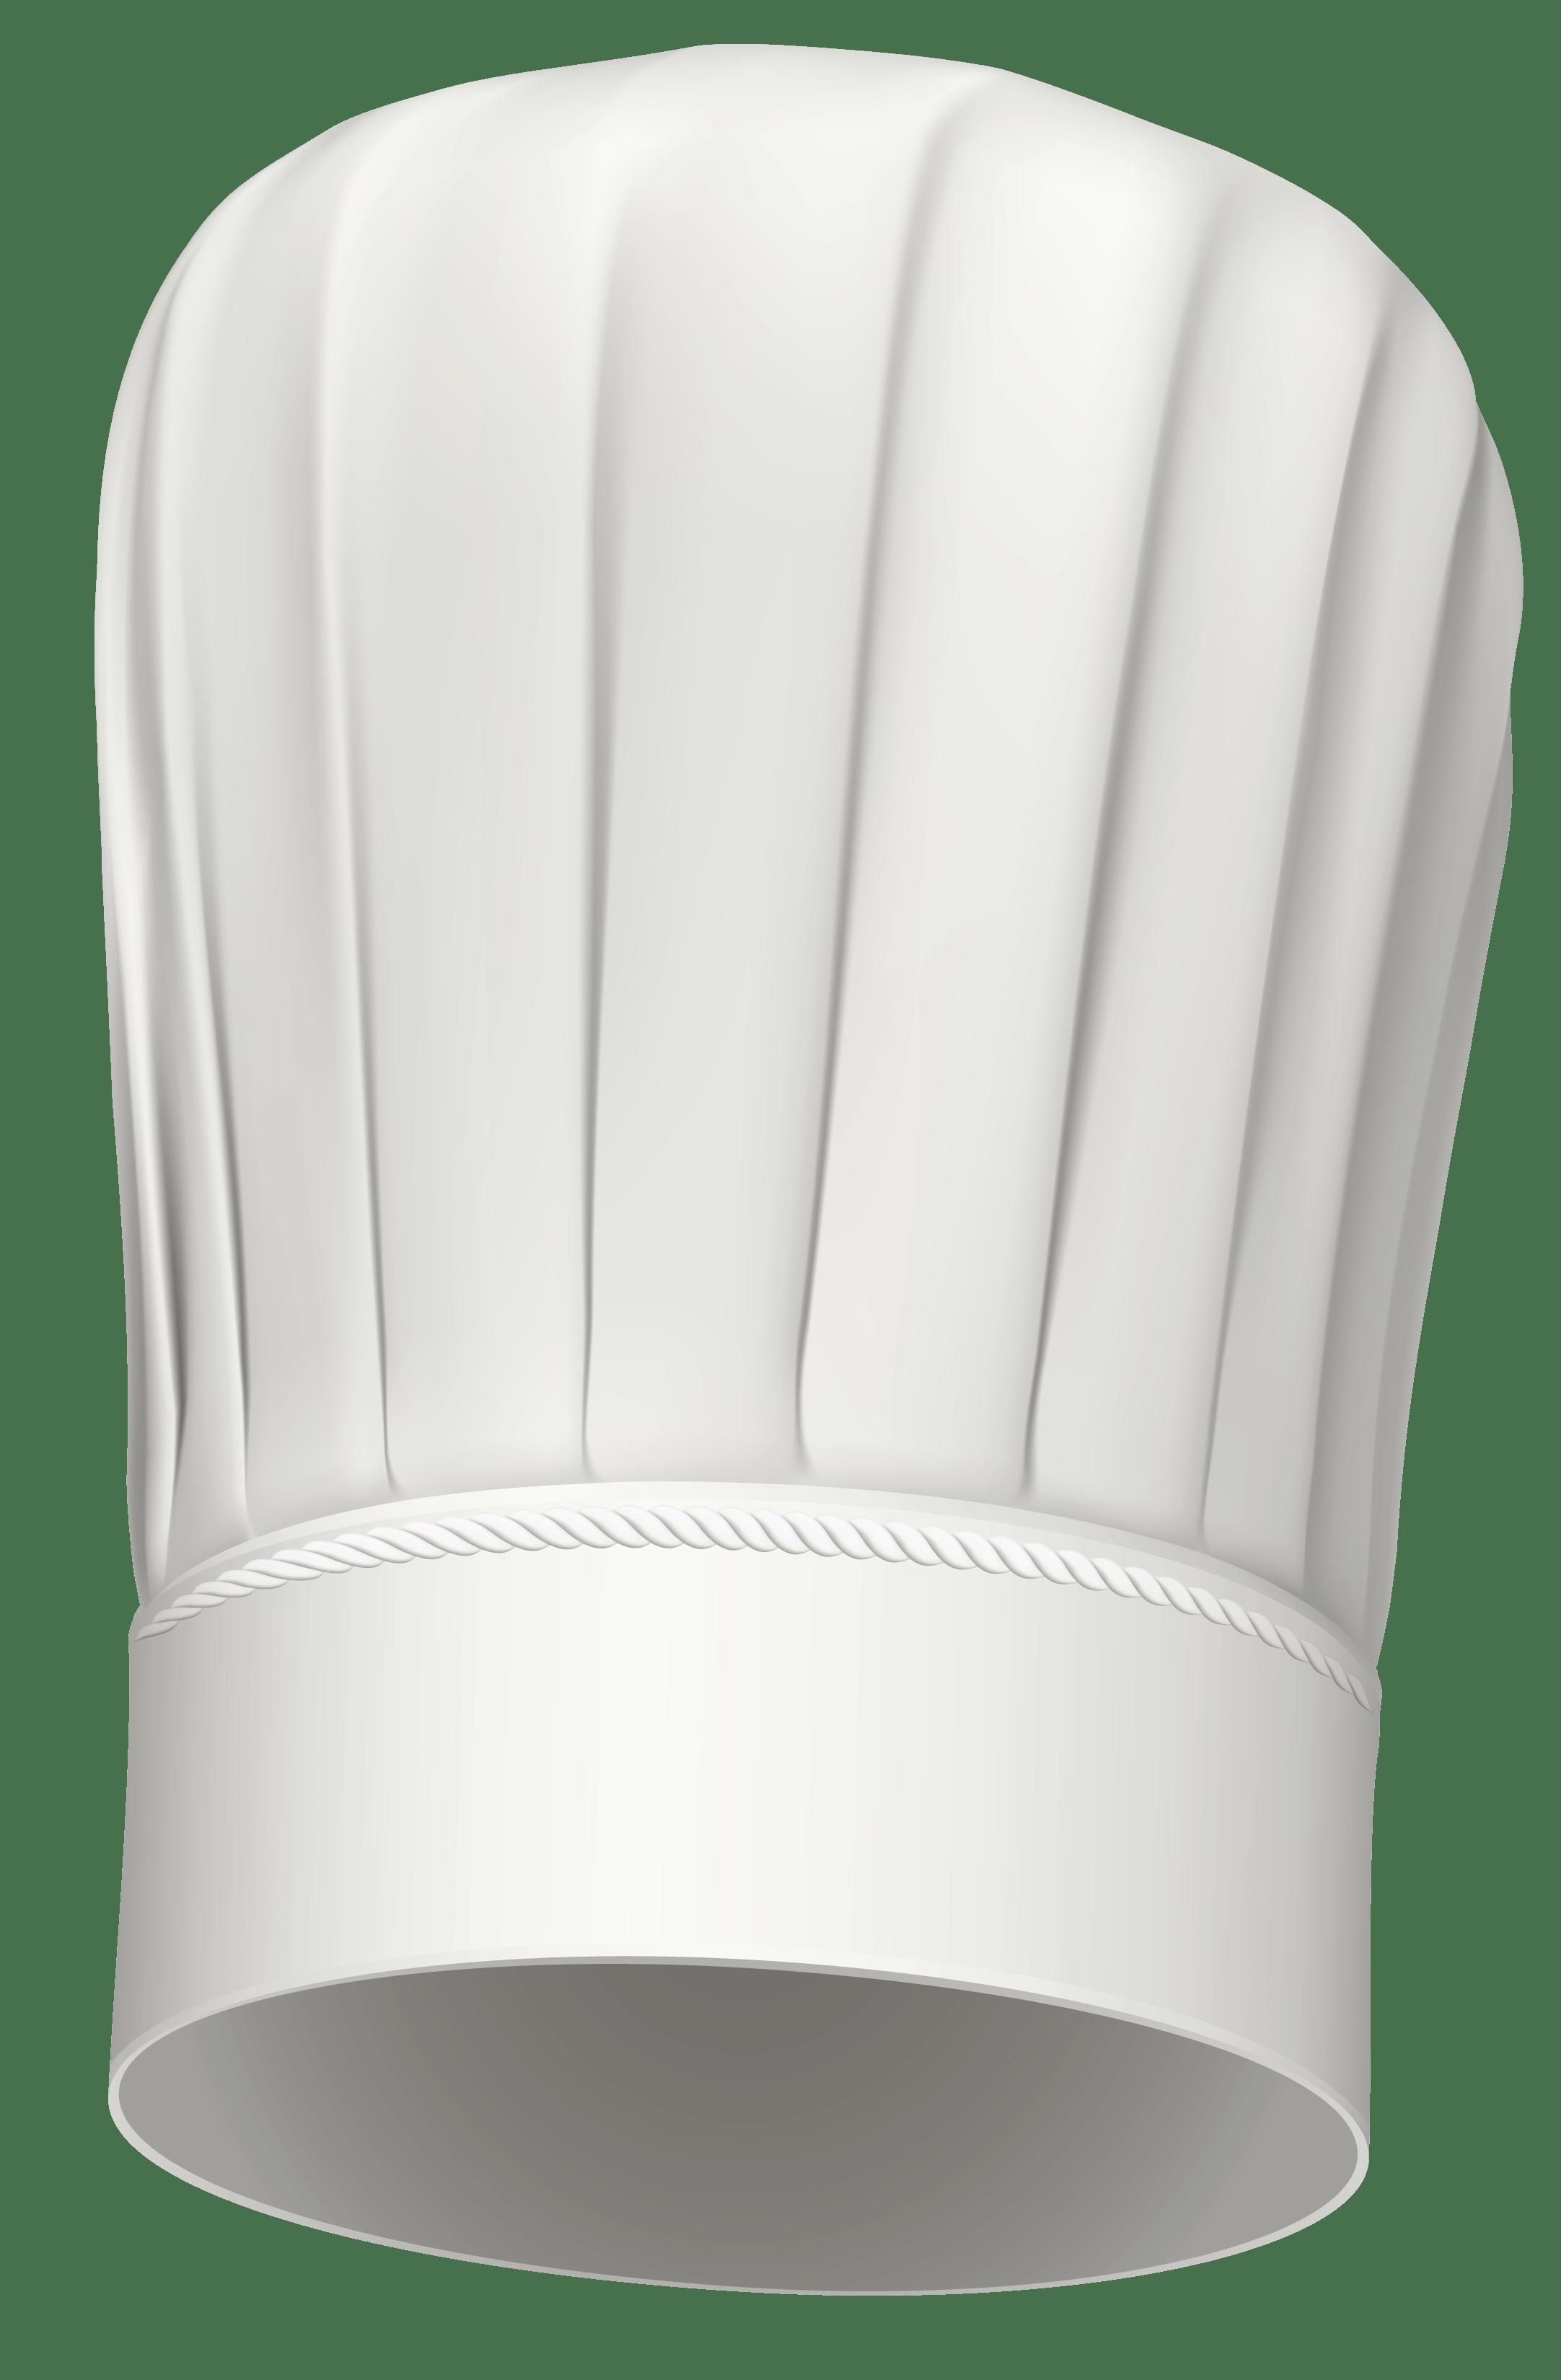 Chef Cap PNG Image | Chef clothes, Chefs hat, Clip art